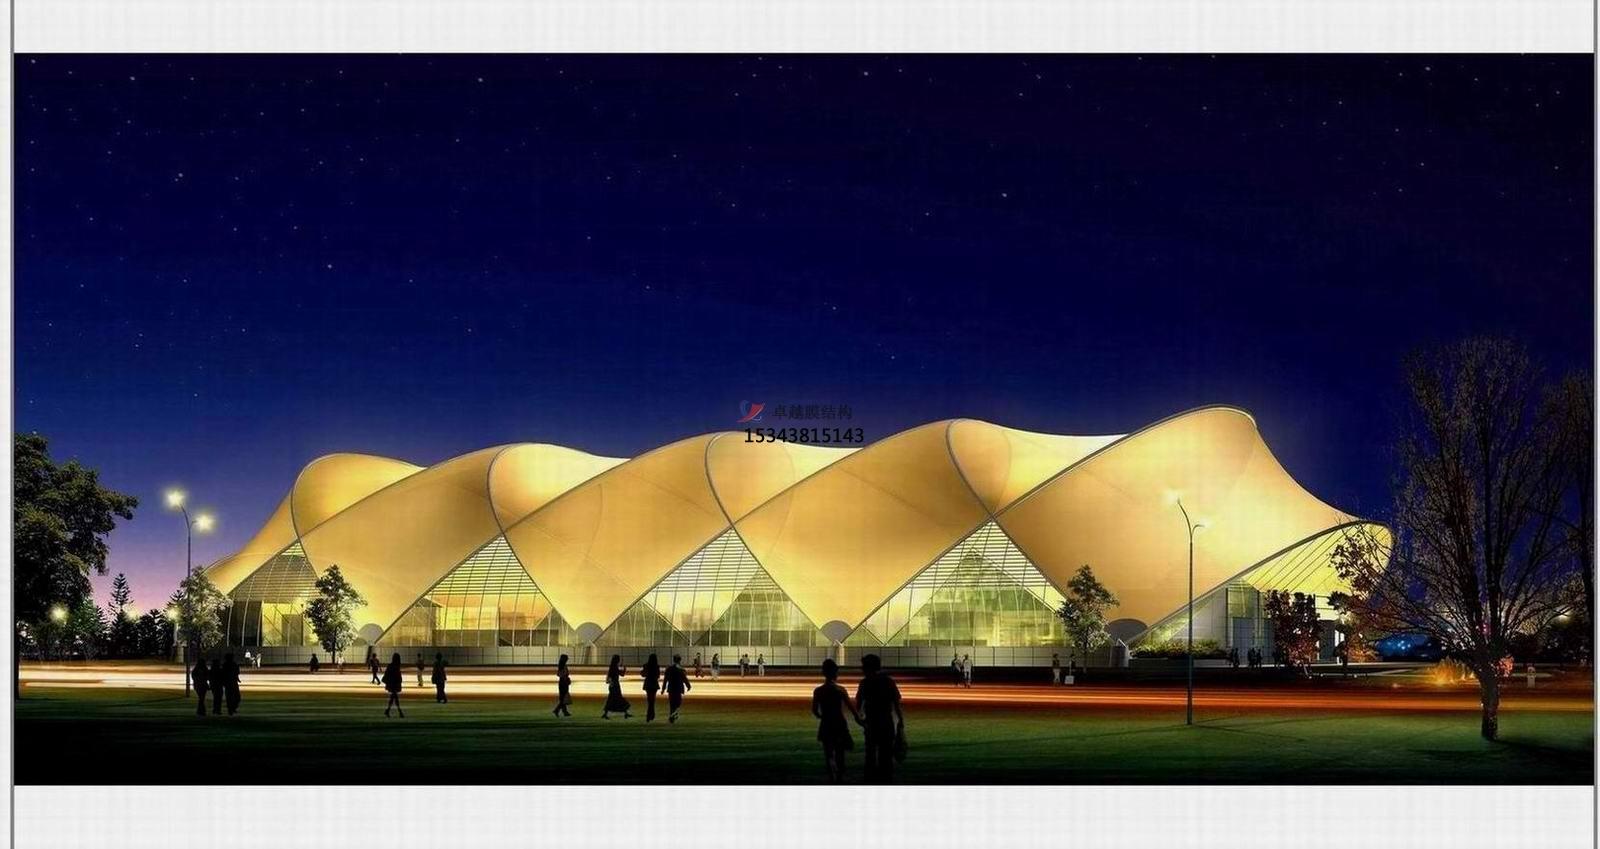 Ptfe膜结构体育场馆